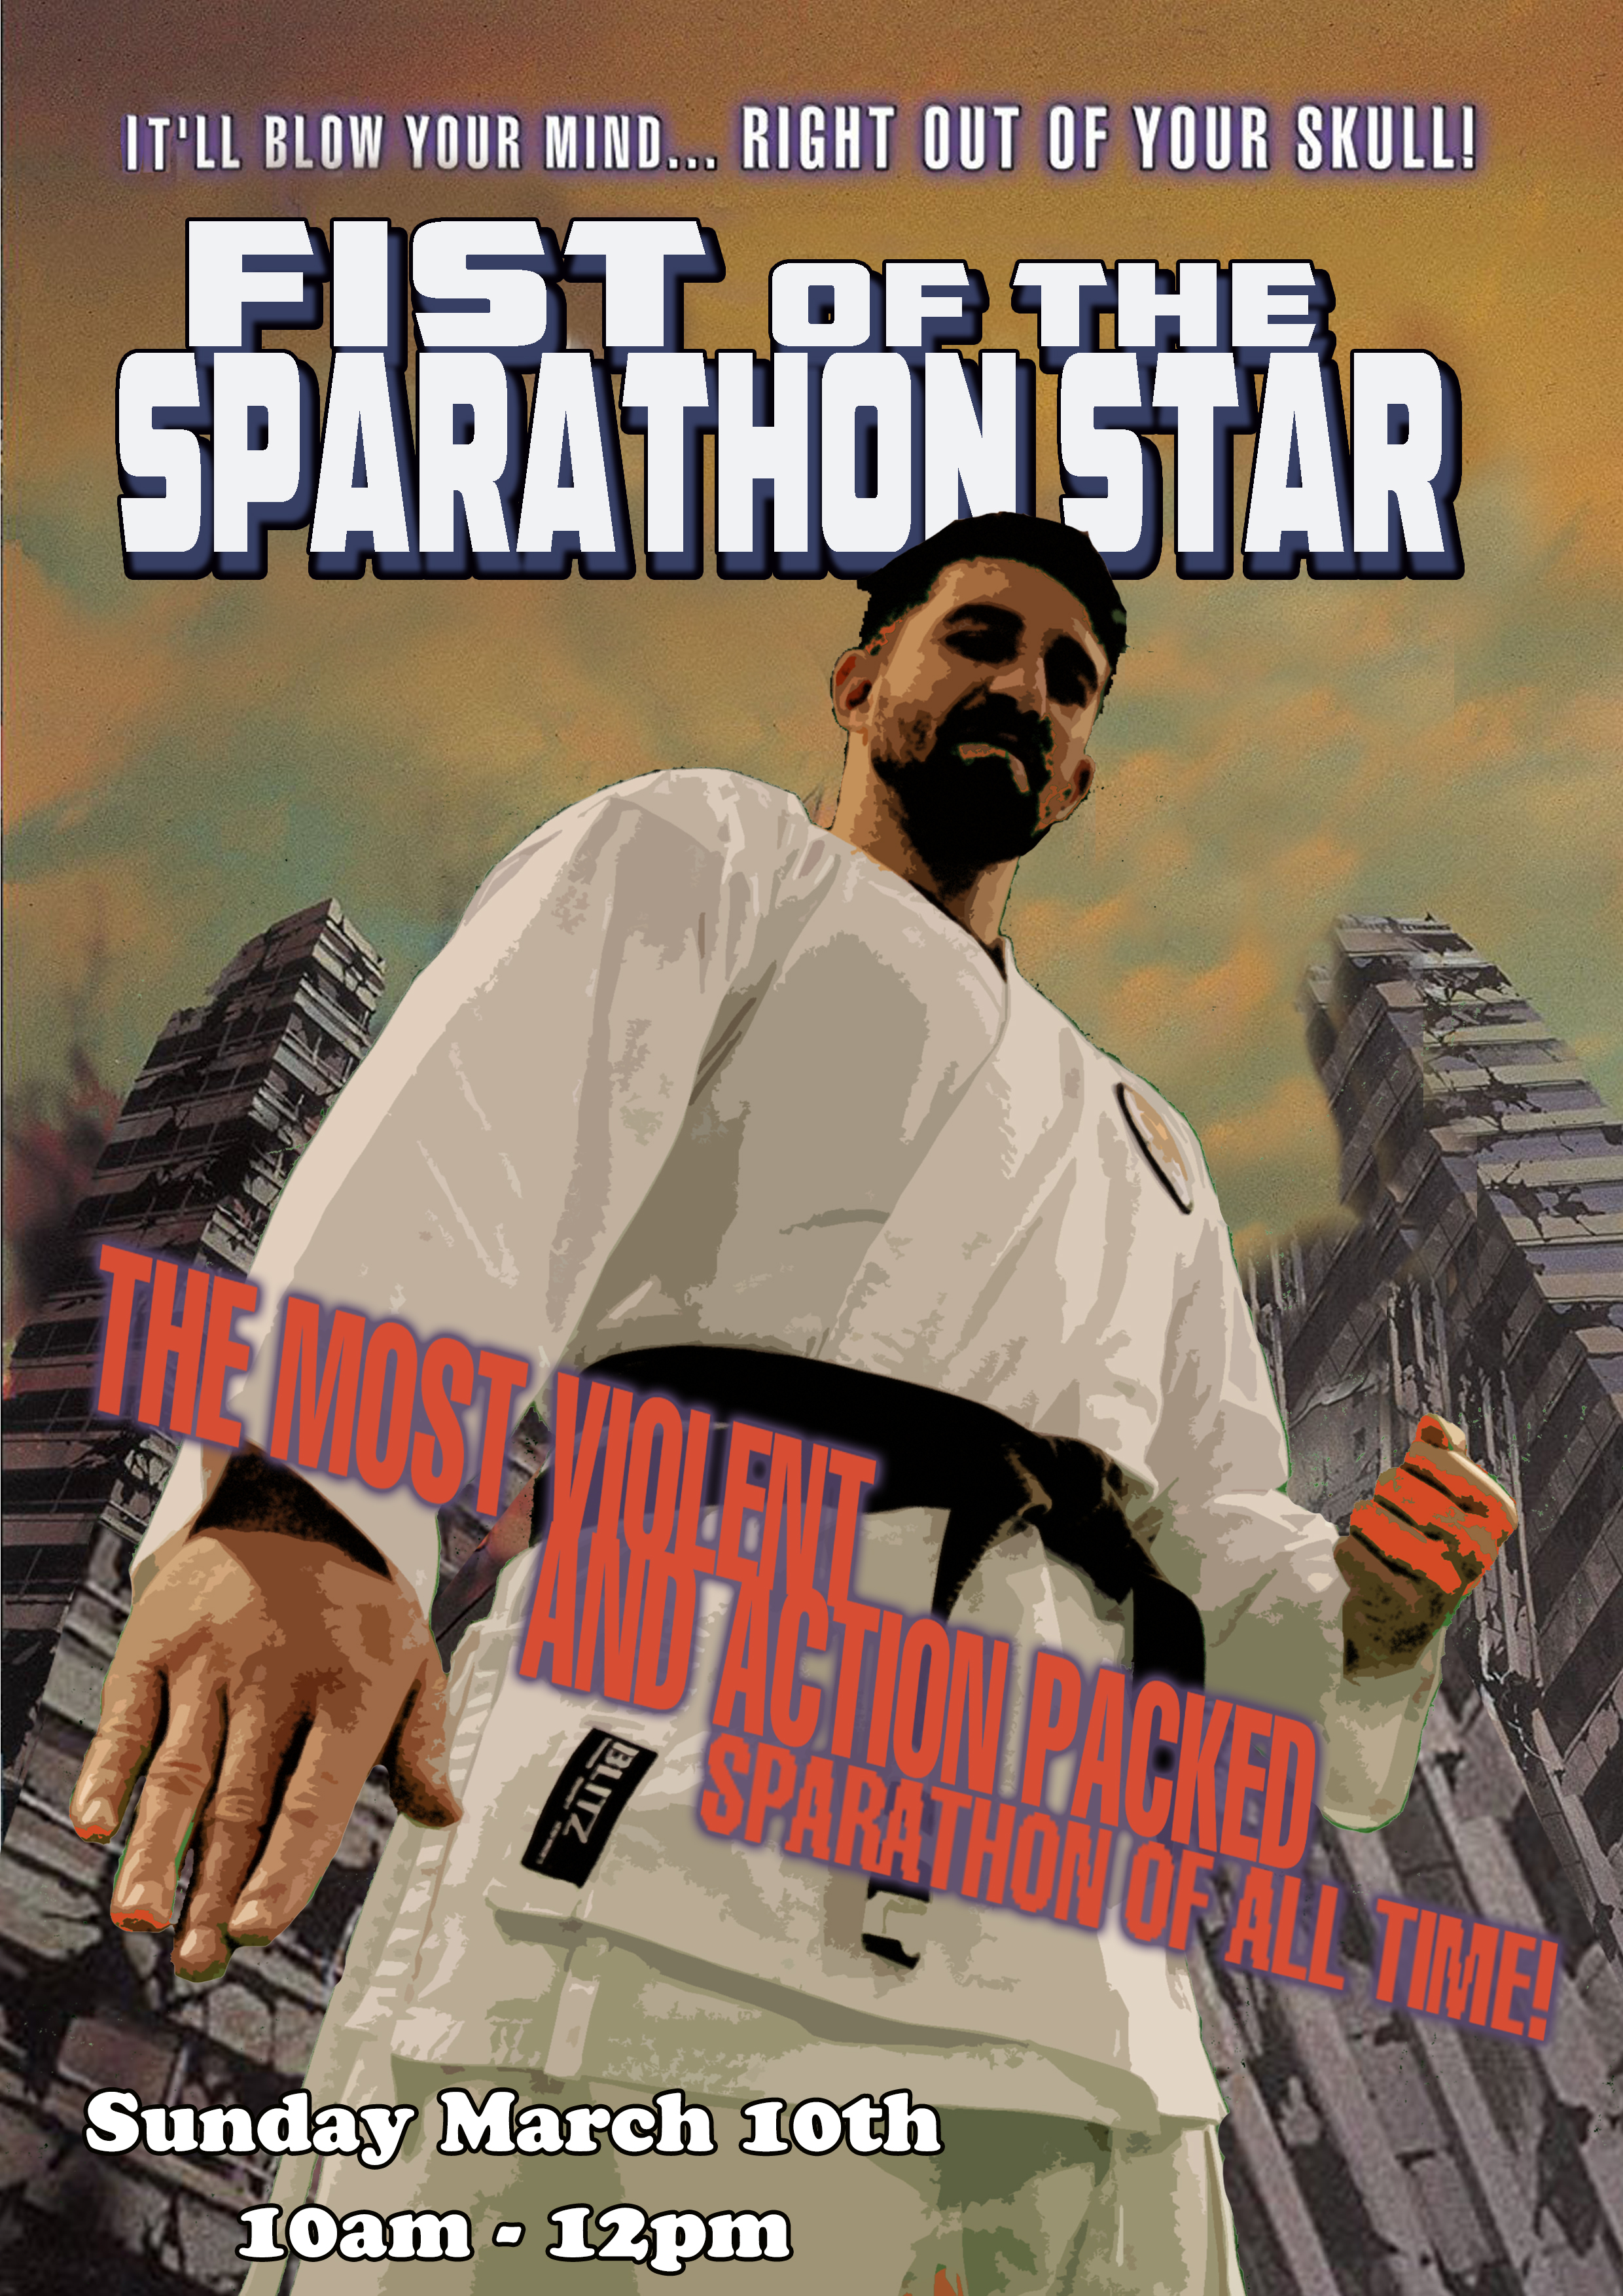 Sparathon Star.jpg